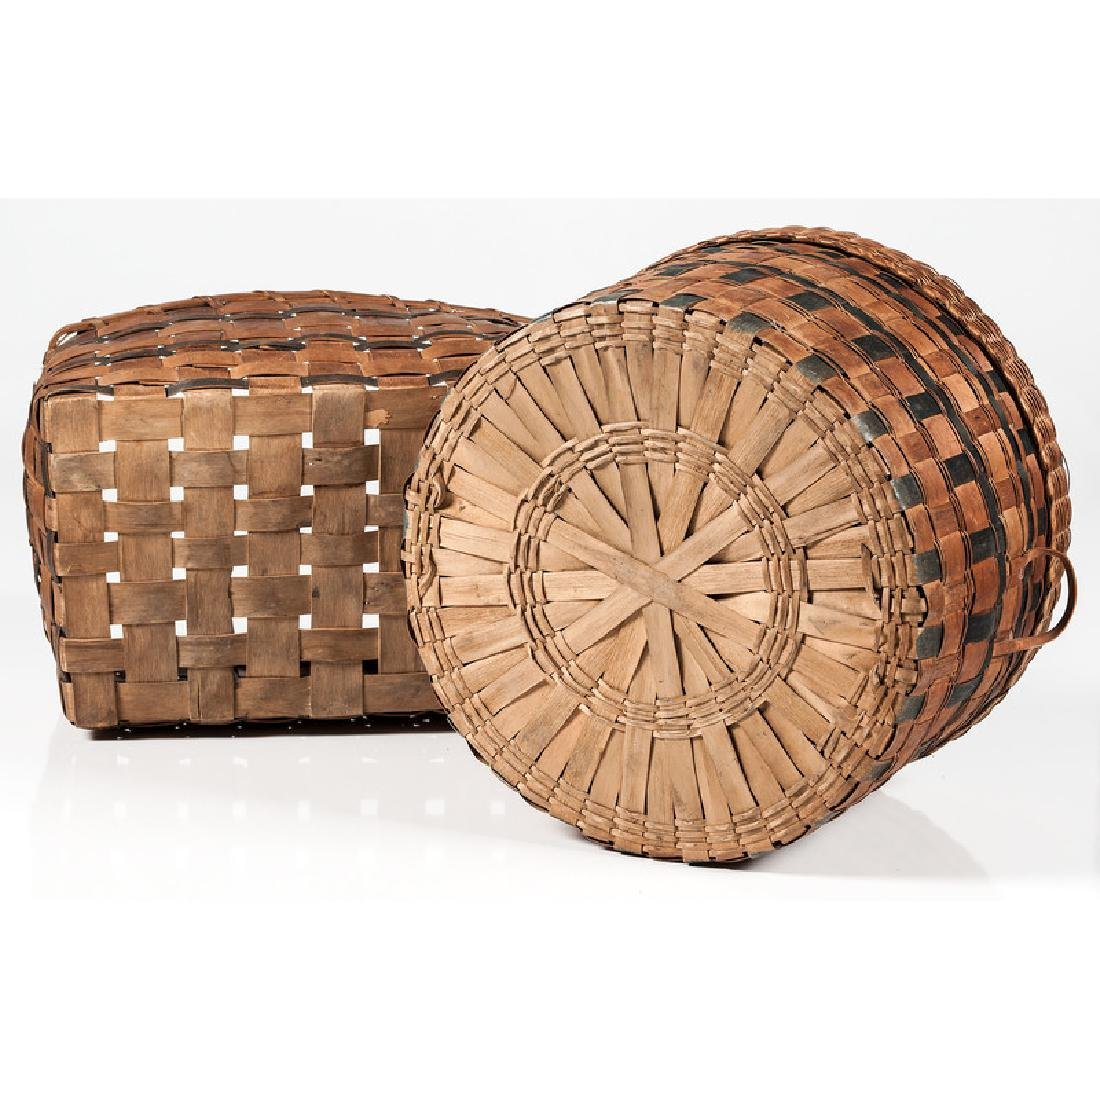 Polychrome Woven Baskets - 4